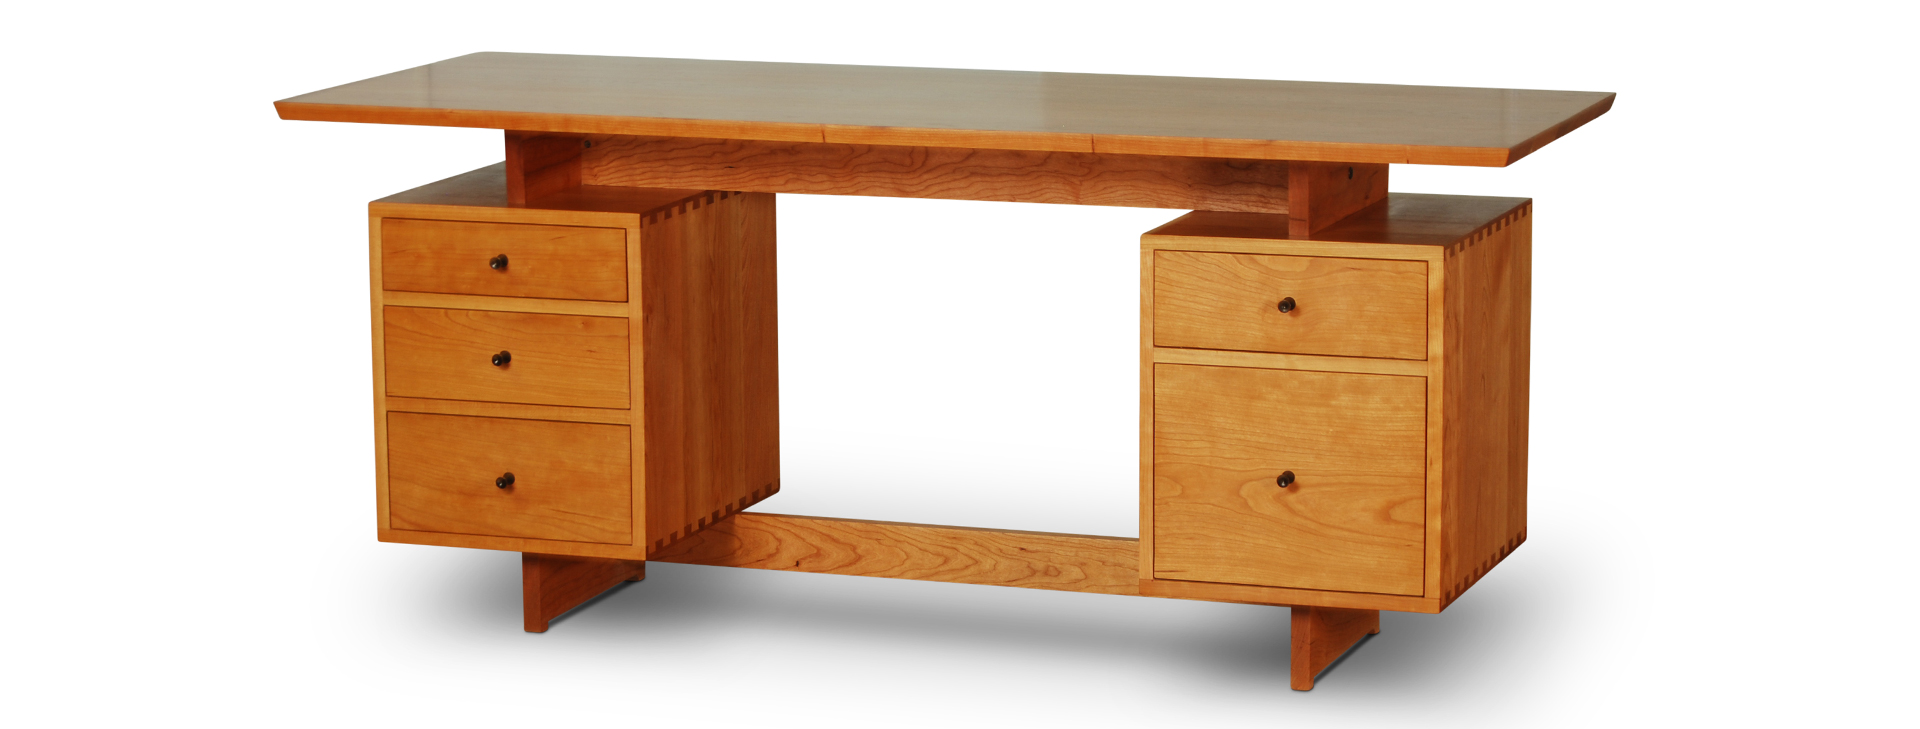 AS Desk Double Pedestal